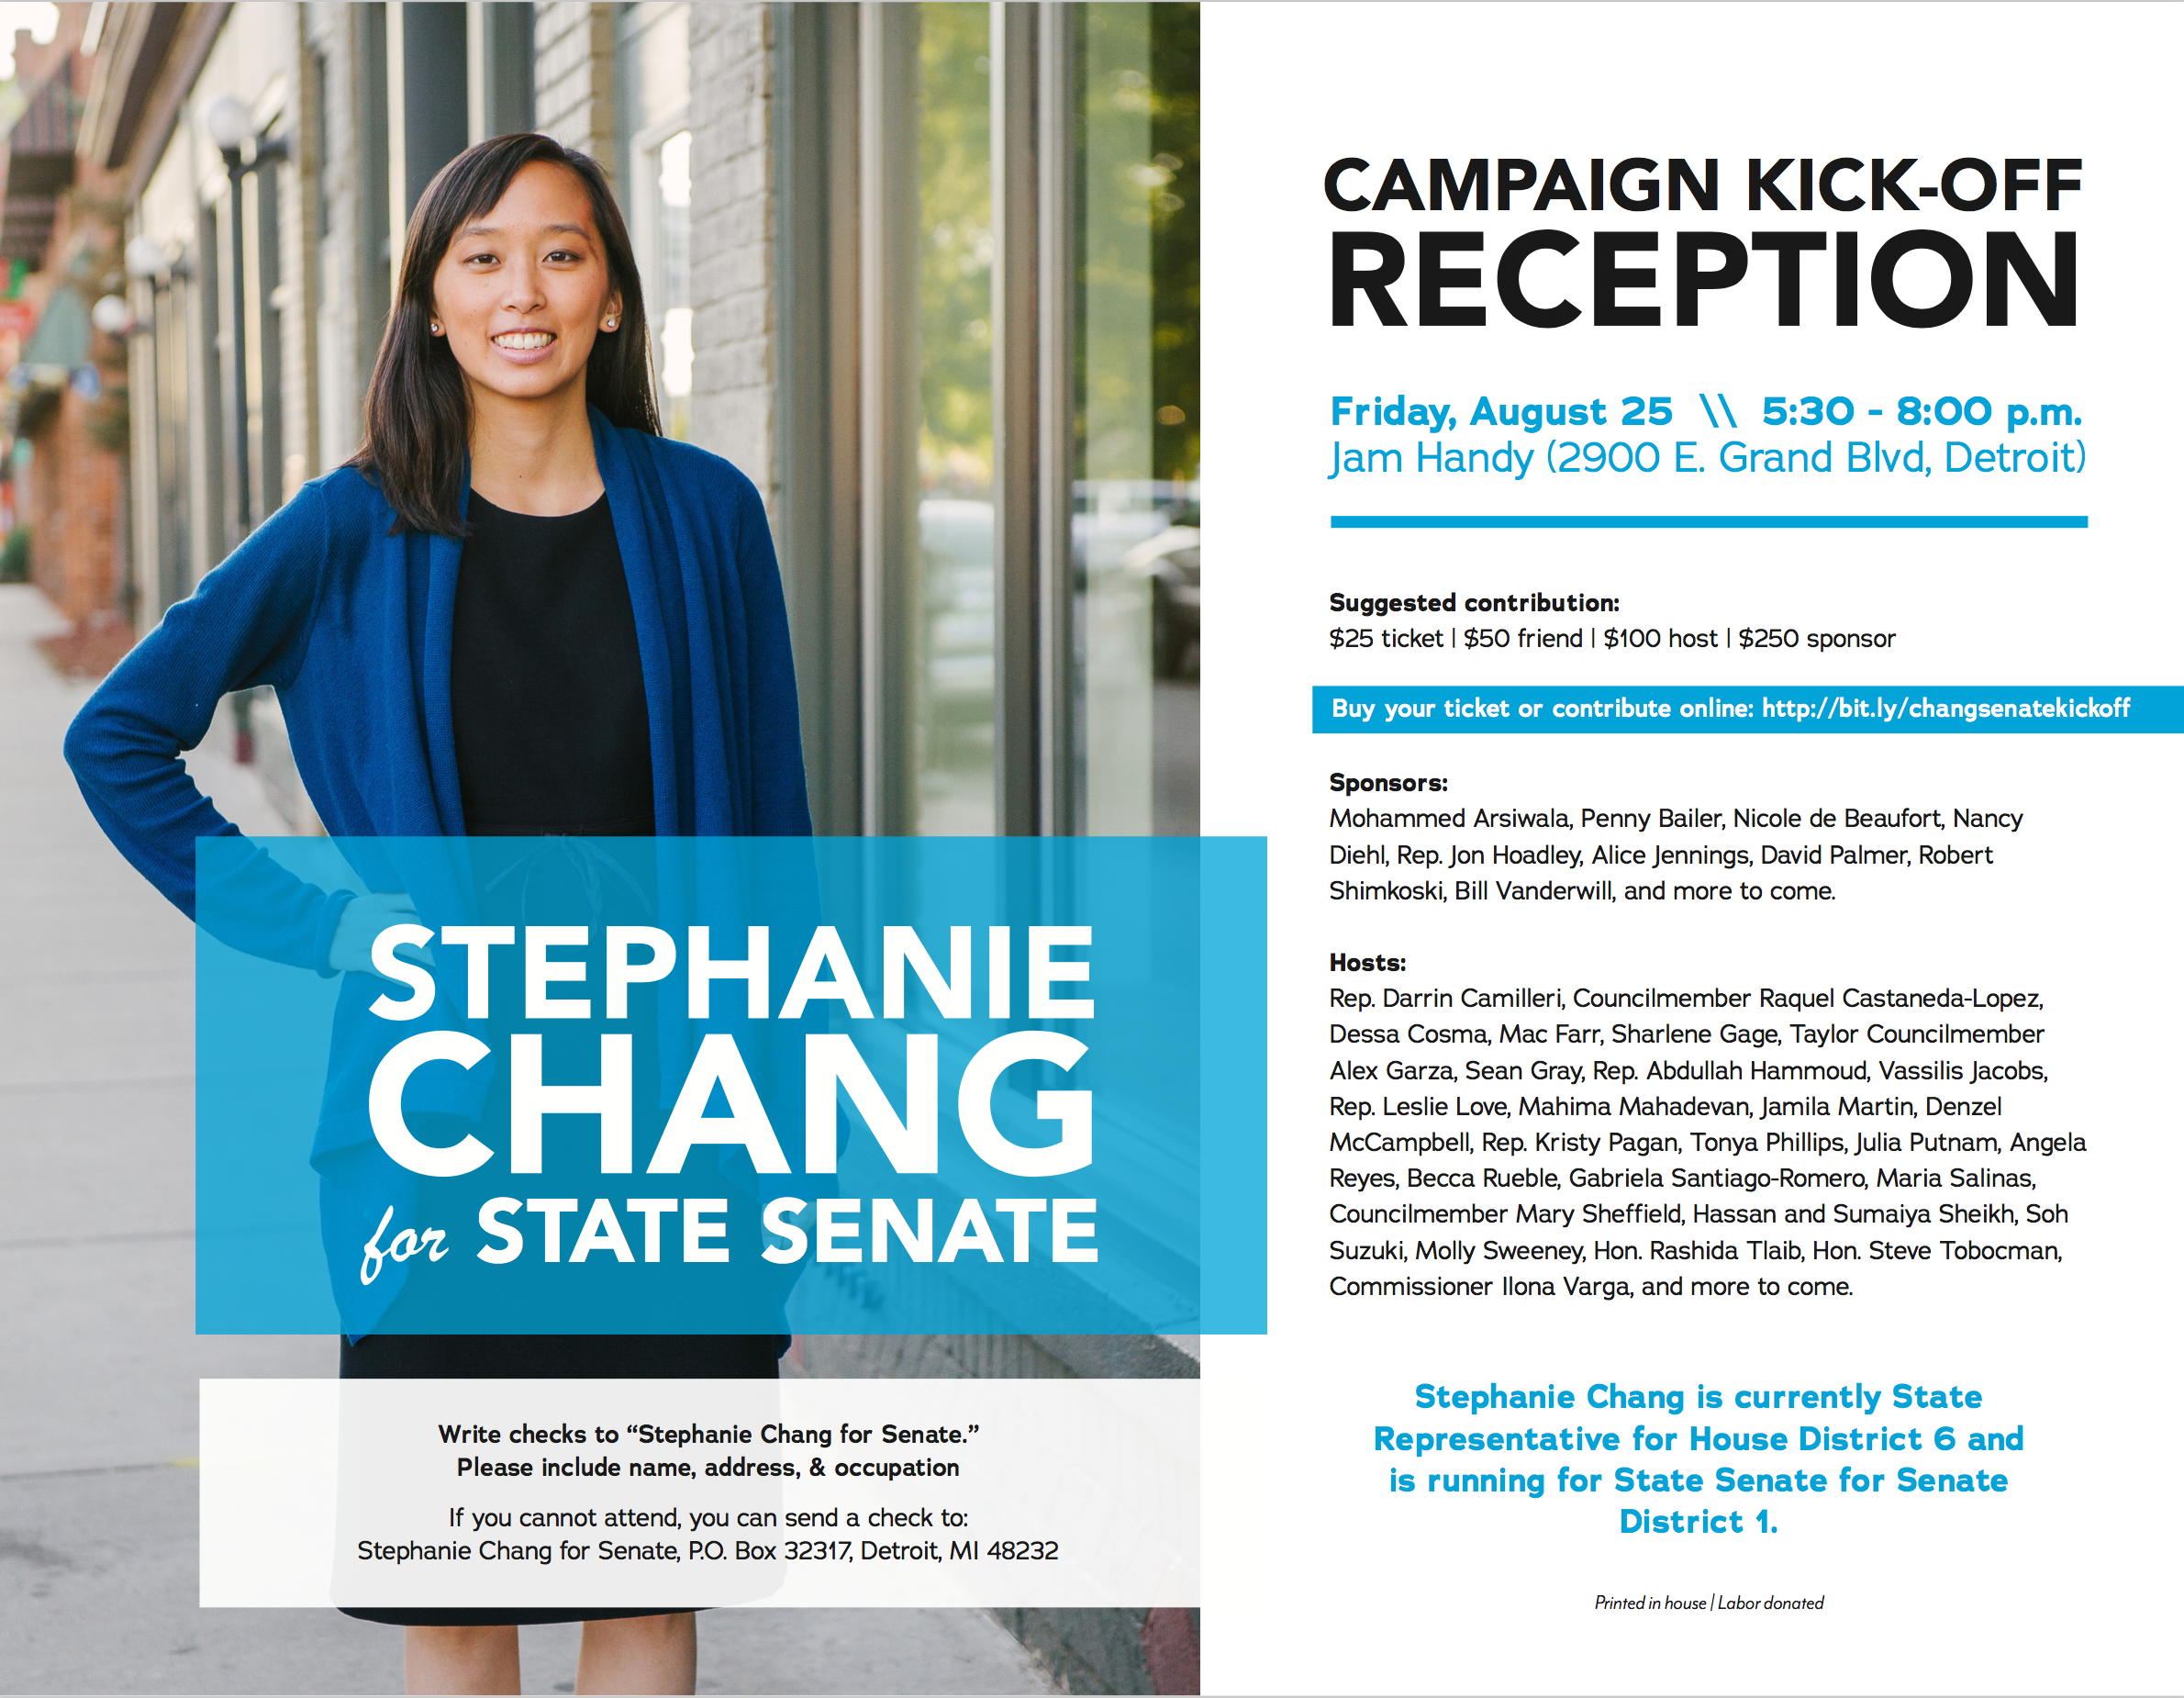 Chang_senate_kick_off_flyer.png